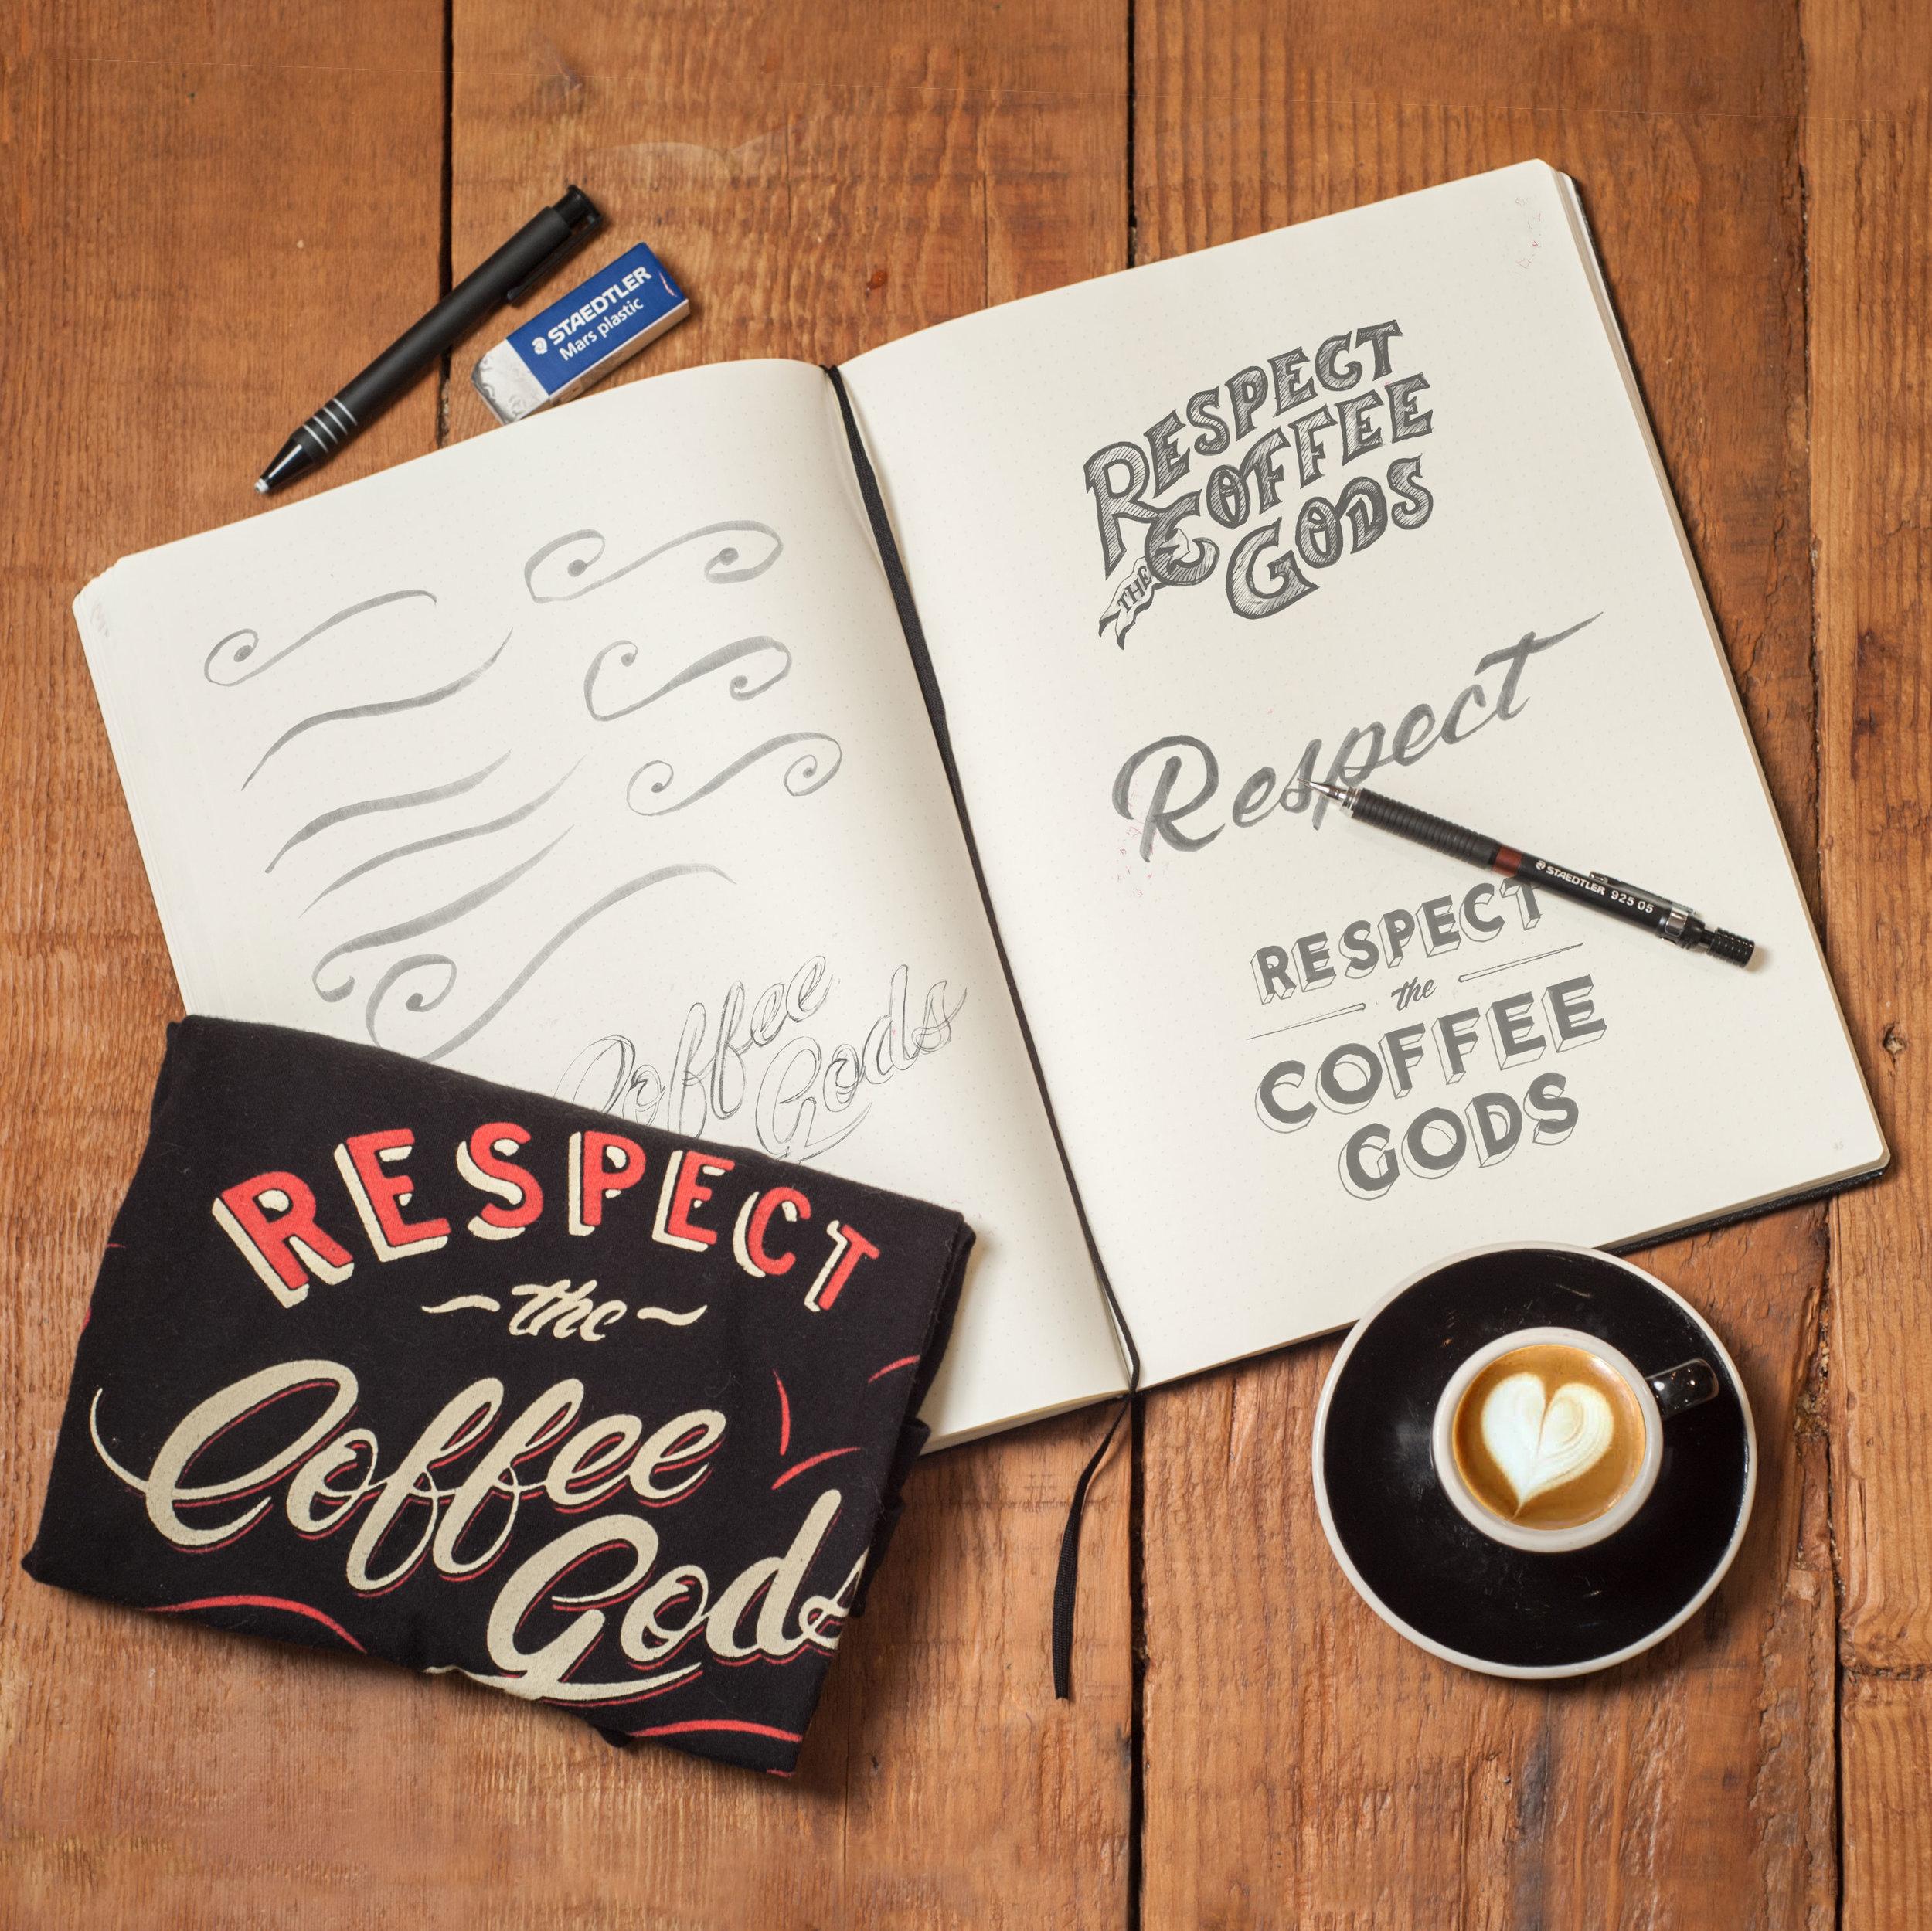 Perk-Kafe-Sketchbook-by-Eric-Friedensohn.jpg